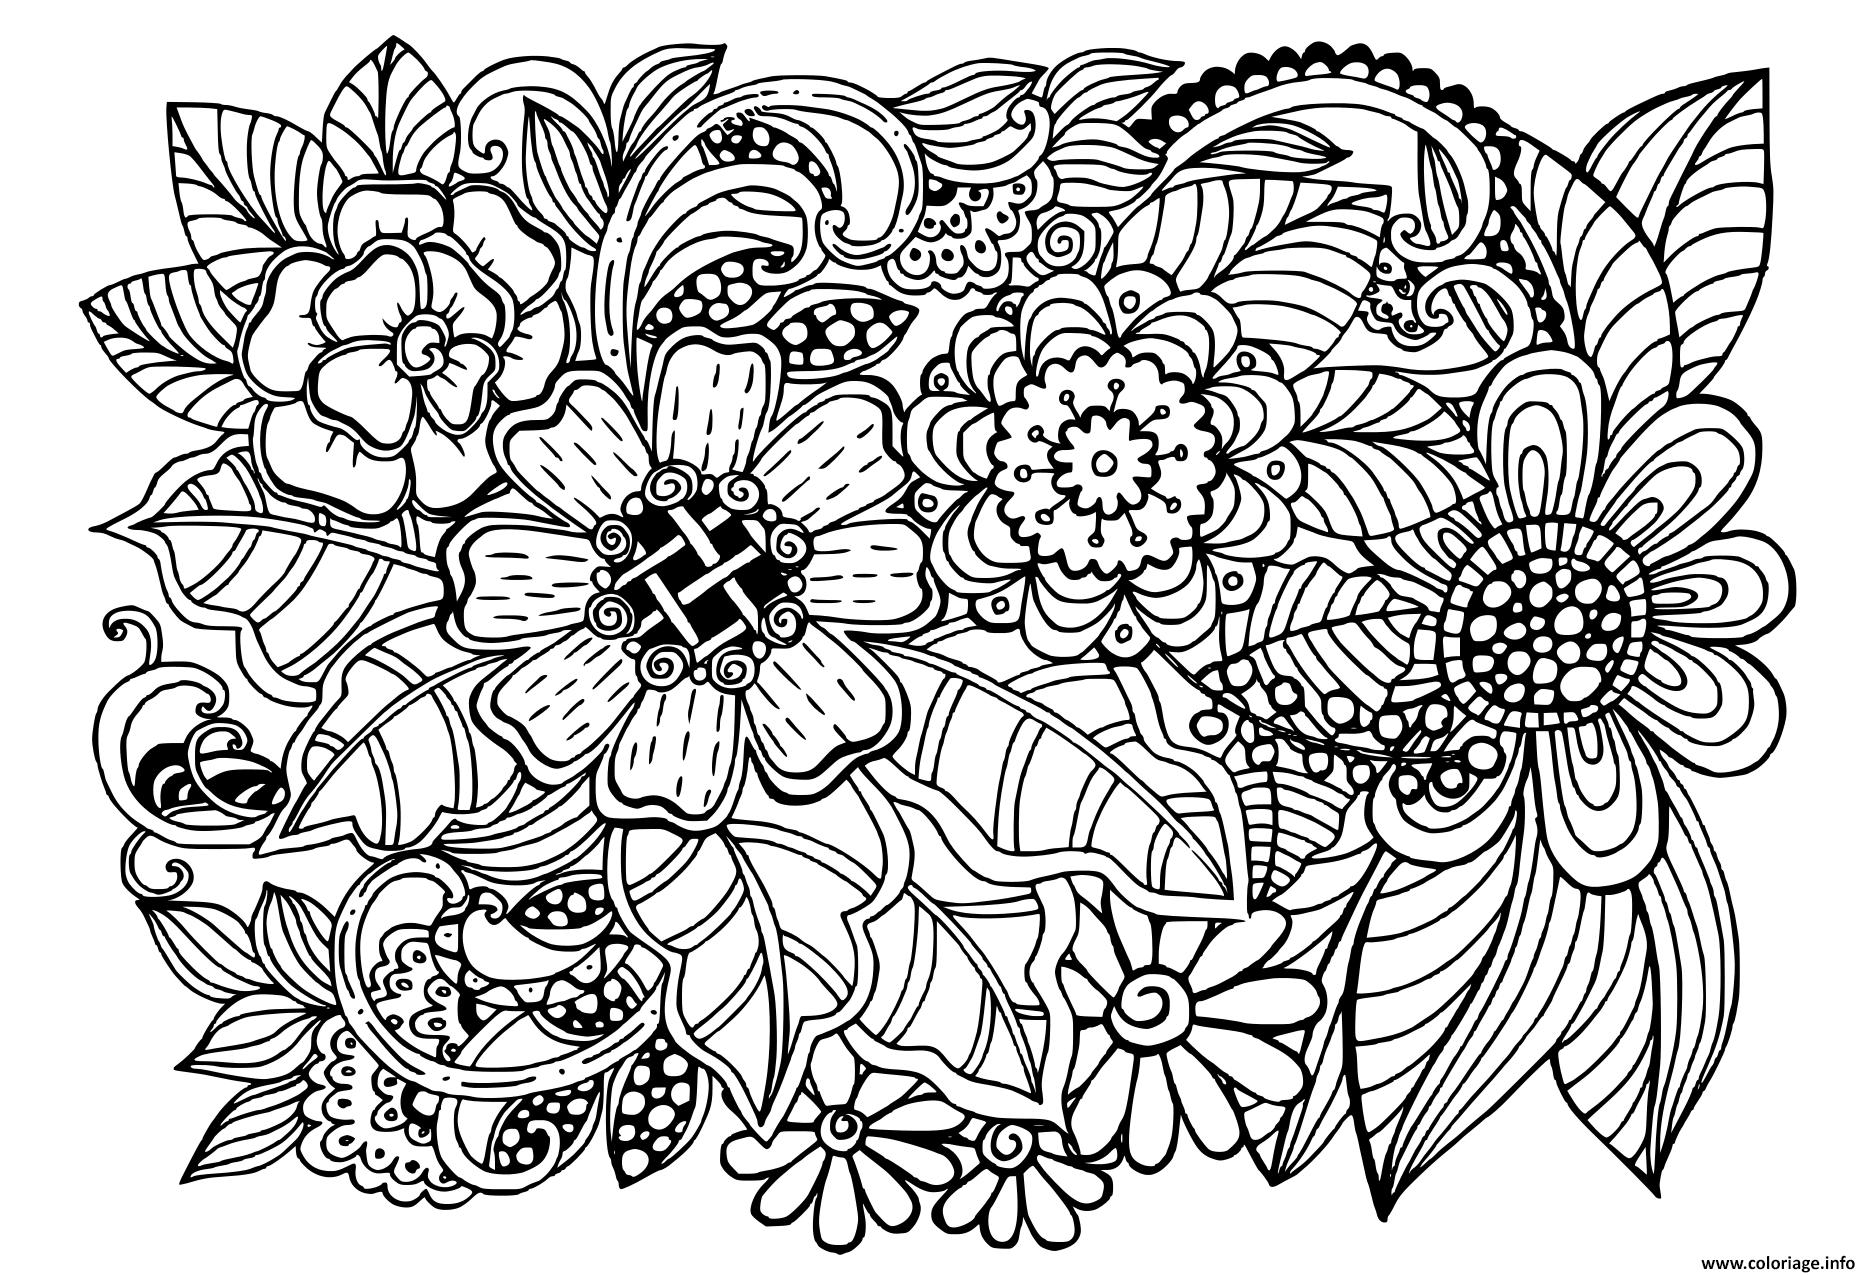 Coloriage Beau Doodle Motif Floral Adulte Dessin Adulte A Imprimer